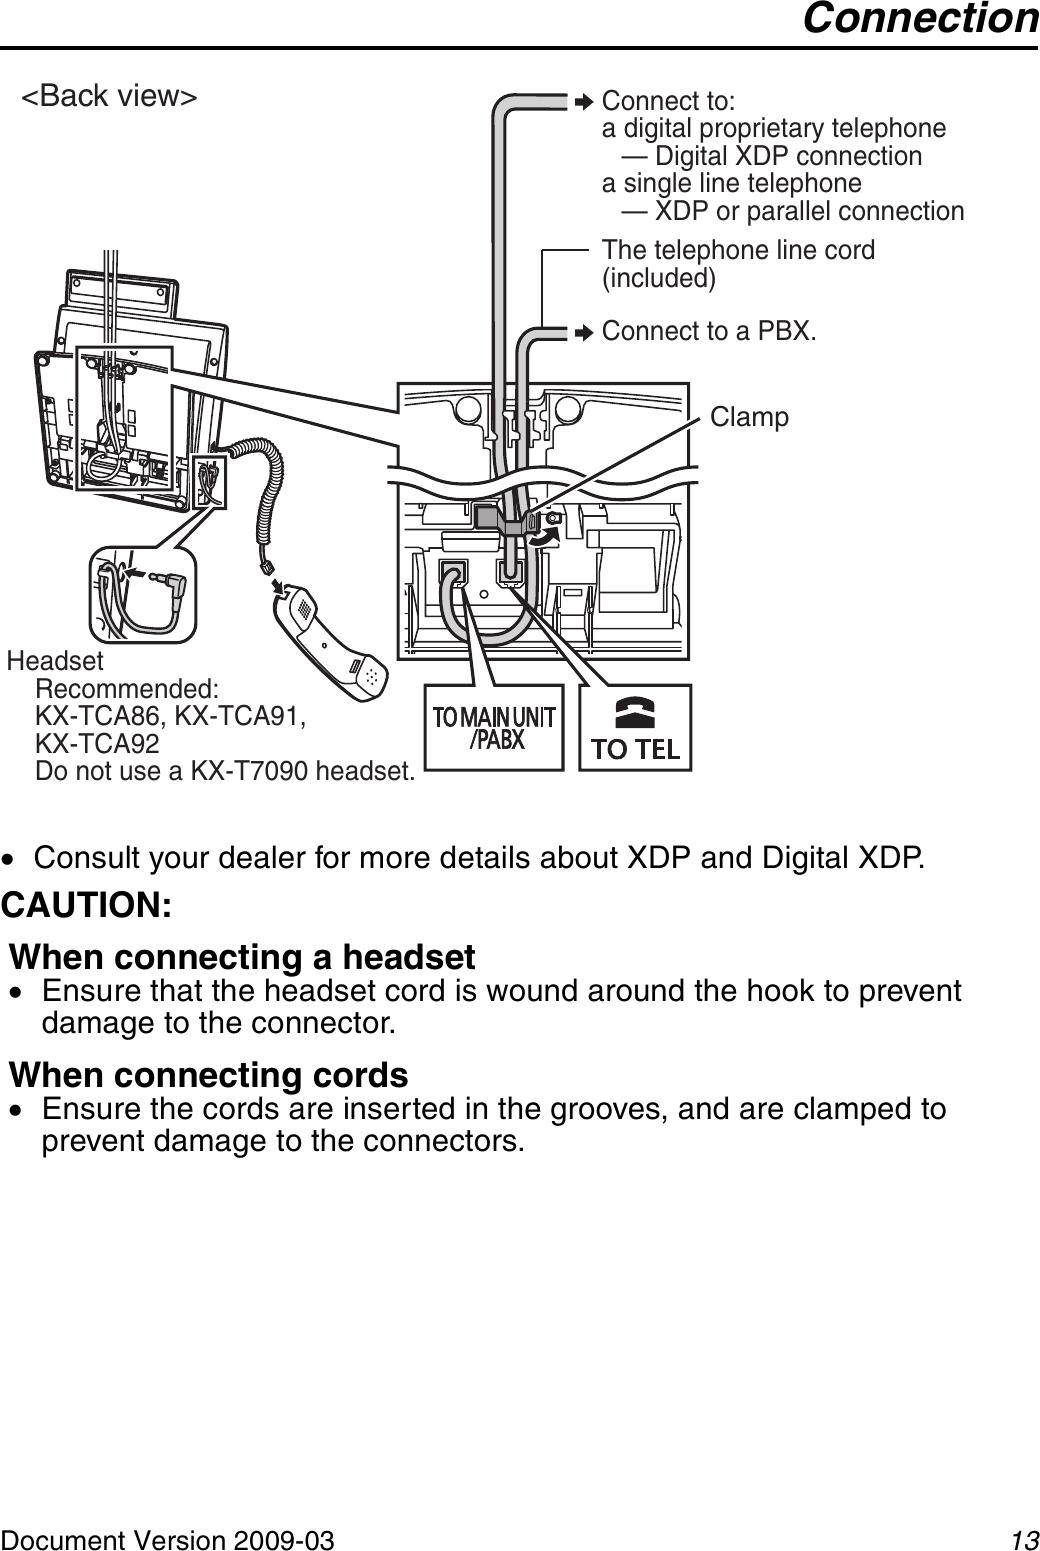 Panasonic Kxdt333 Digital Proprietary Telephone Quick